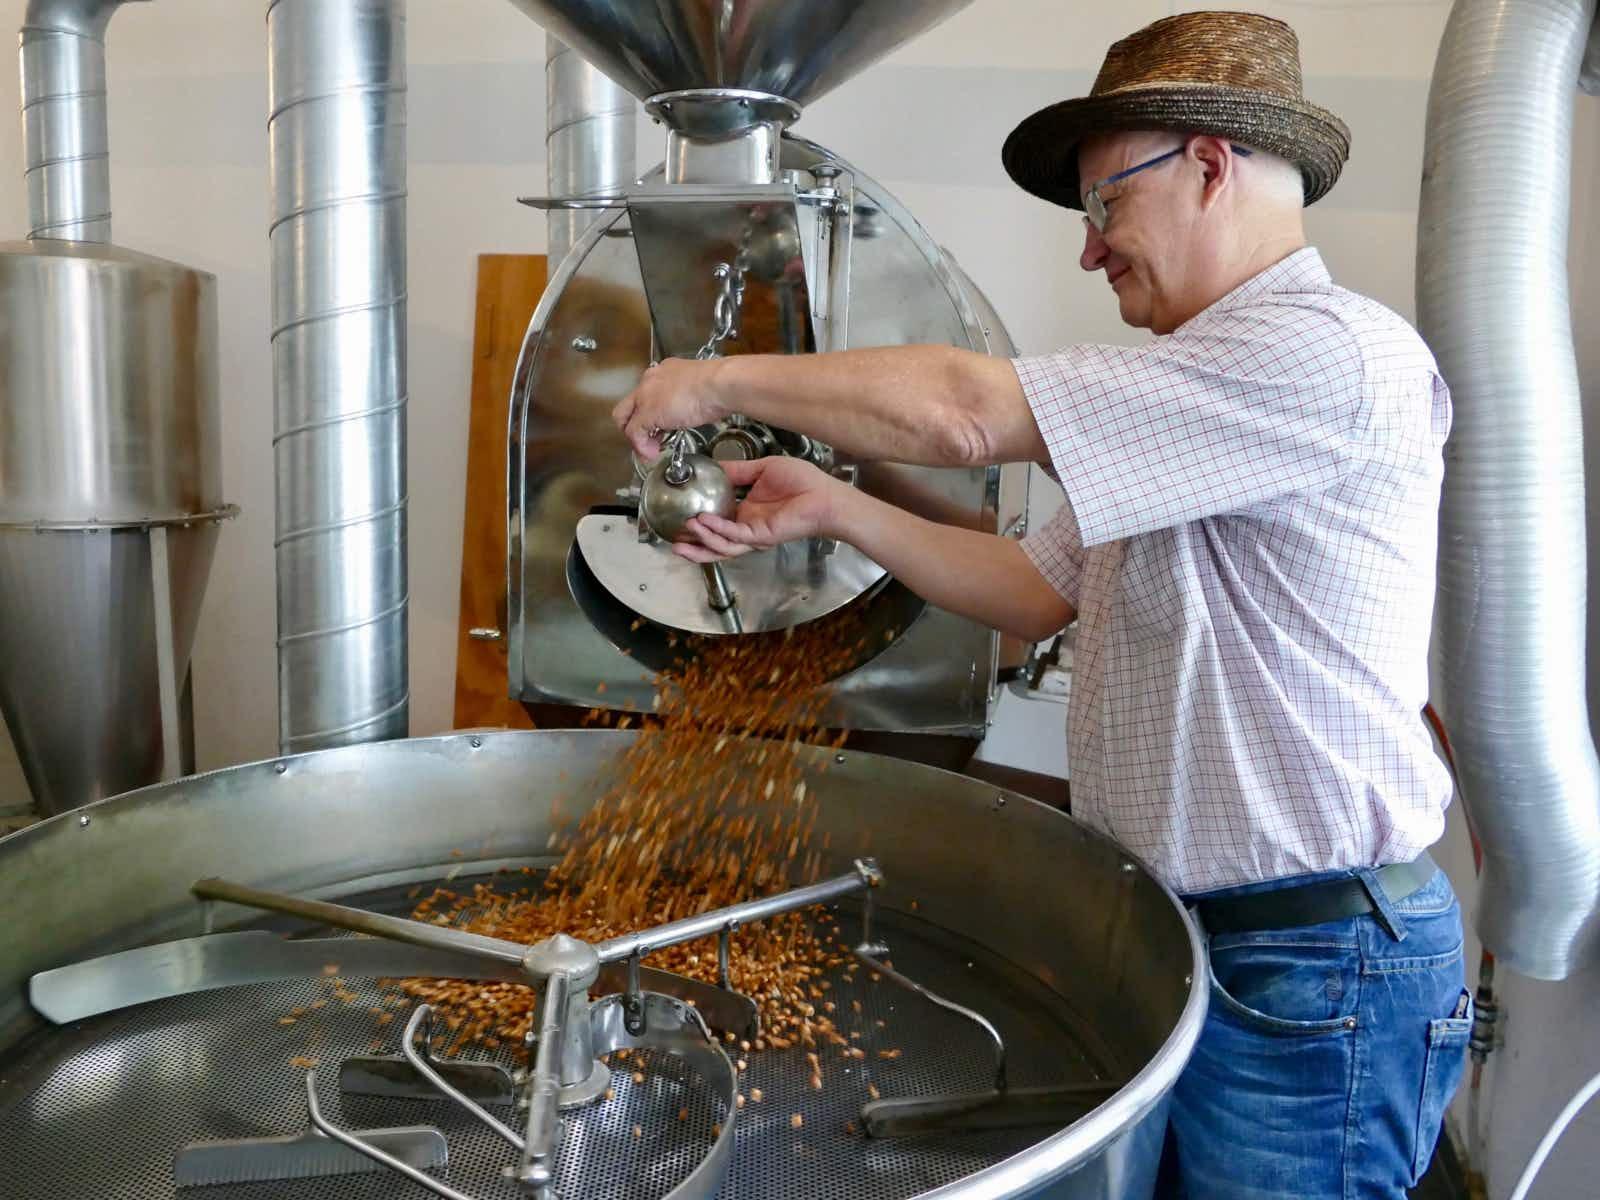 Miller Ilario Garbani roasting corn to make Farina Bóna (good flour) in Ticino, Switzerland © Sarah Gilbert / Lonely Planet